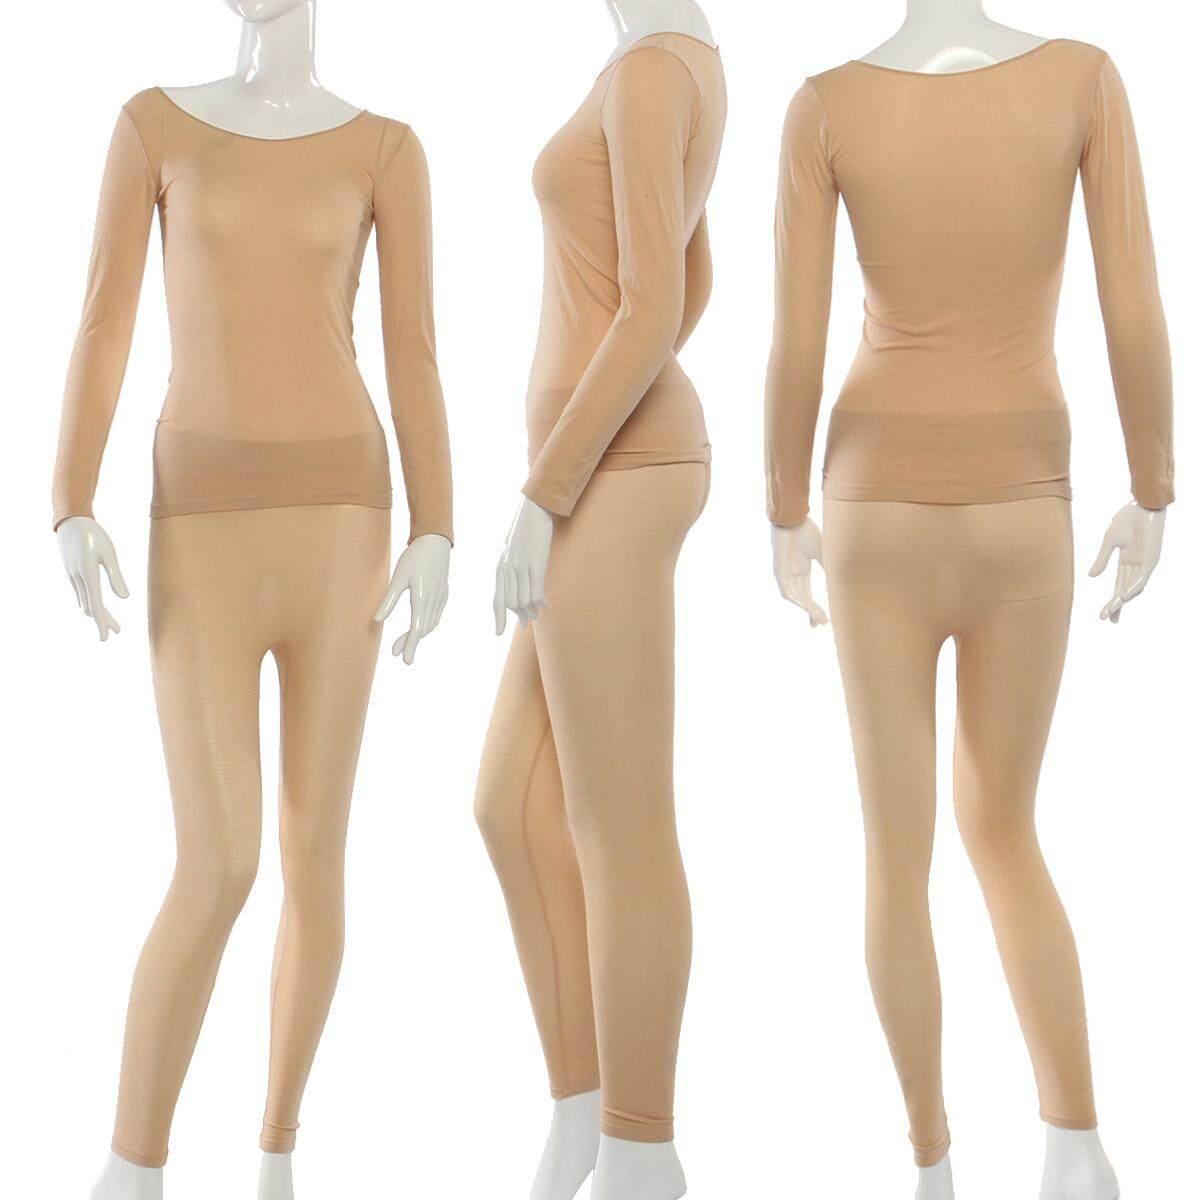 【free Shipping + Flash Deal】womens Ladies Winter Warm Thermal Underwear Set Long Sleeve Pajama Nightwear By Audew.